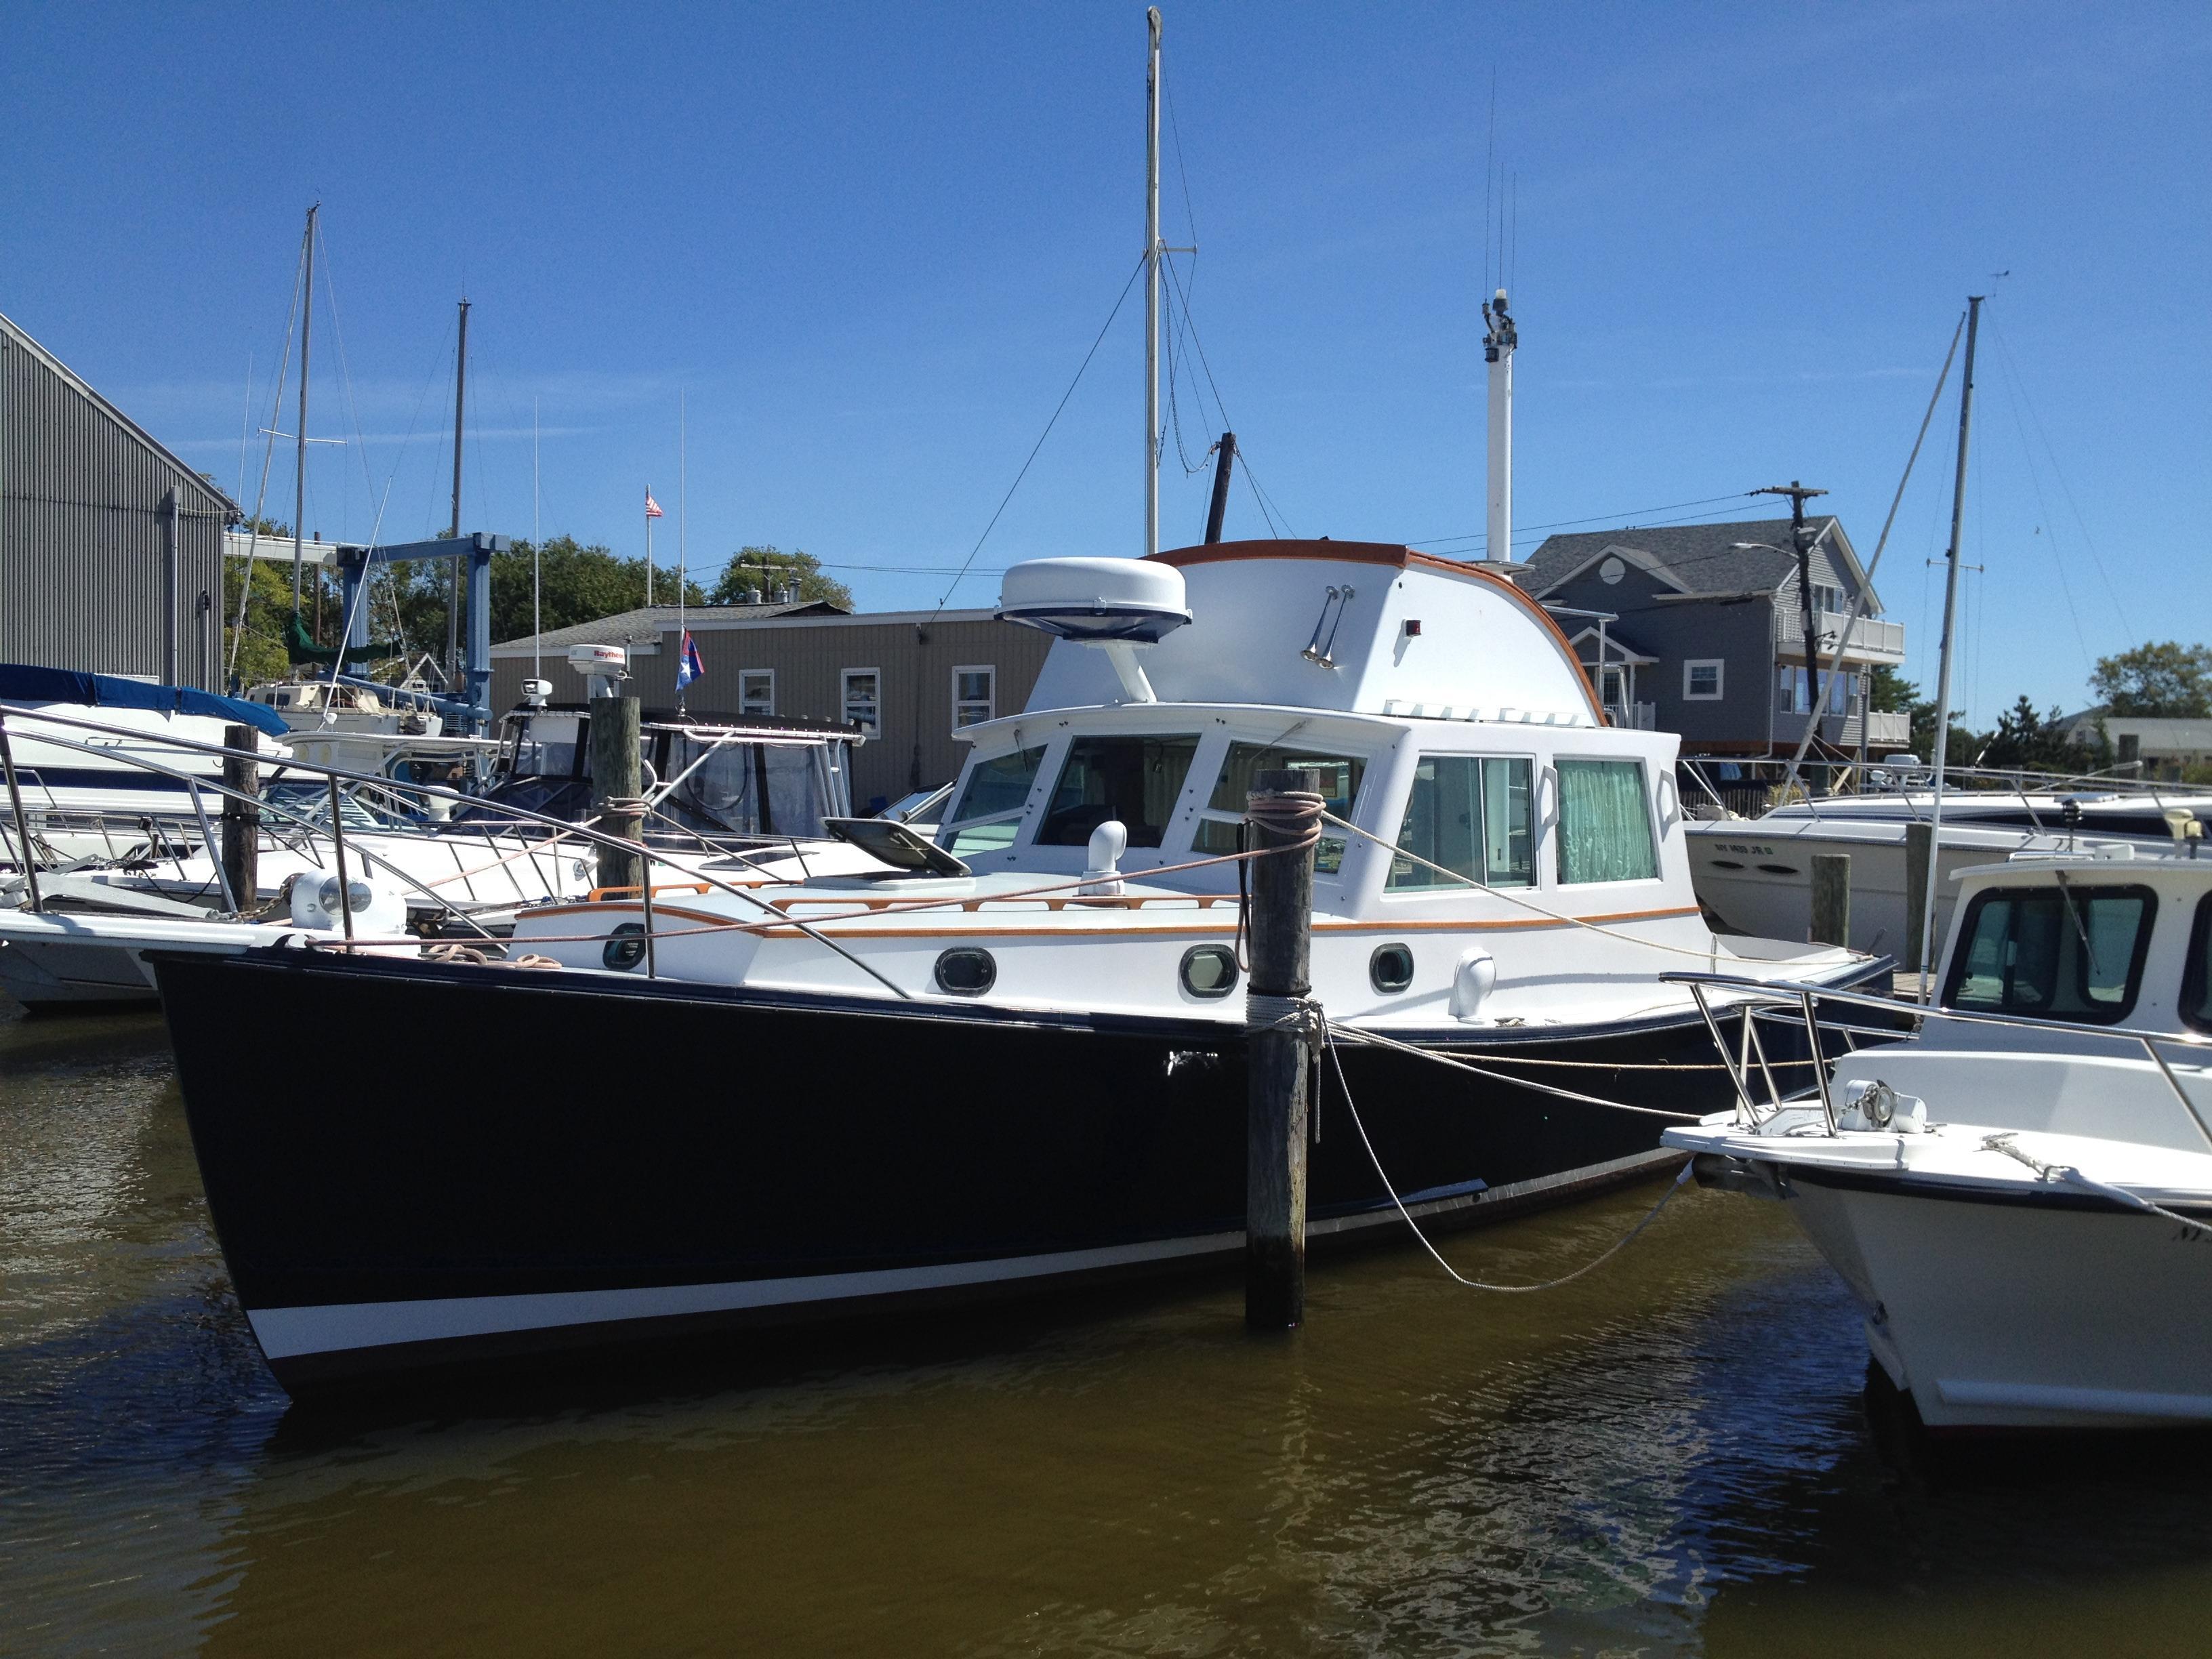 1977 Jarvis Newman Flybridge Power Boat For Sale - www.yachtworld.com